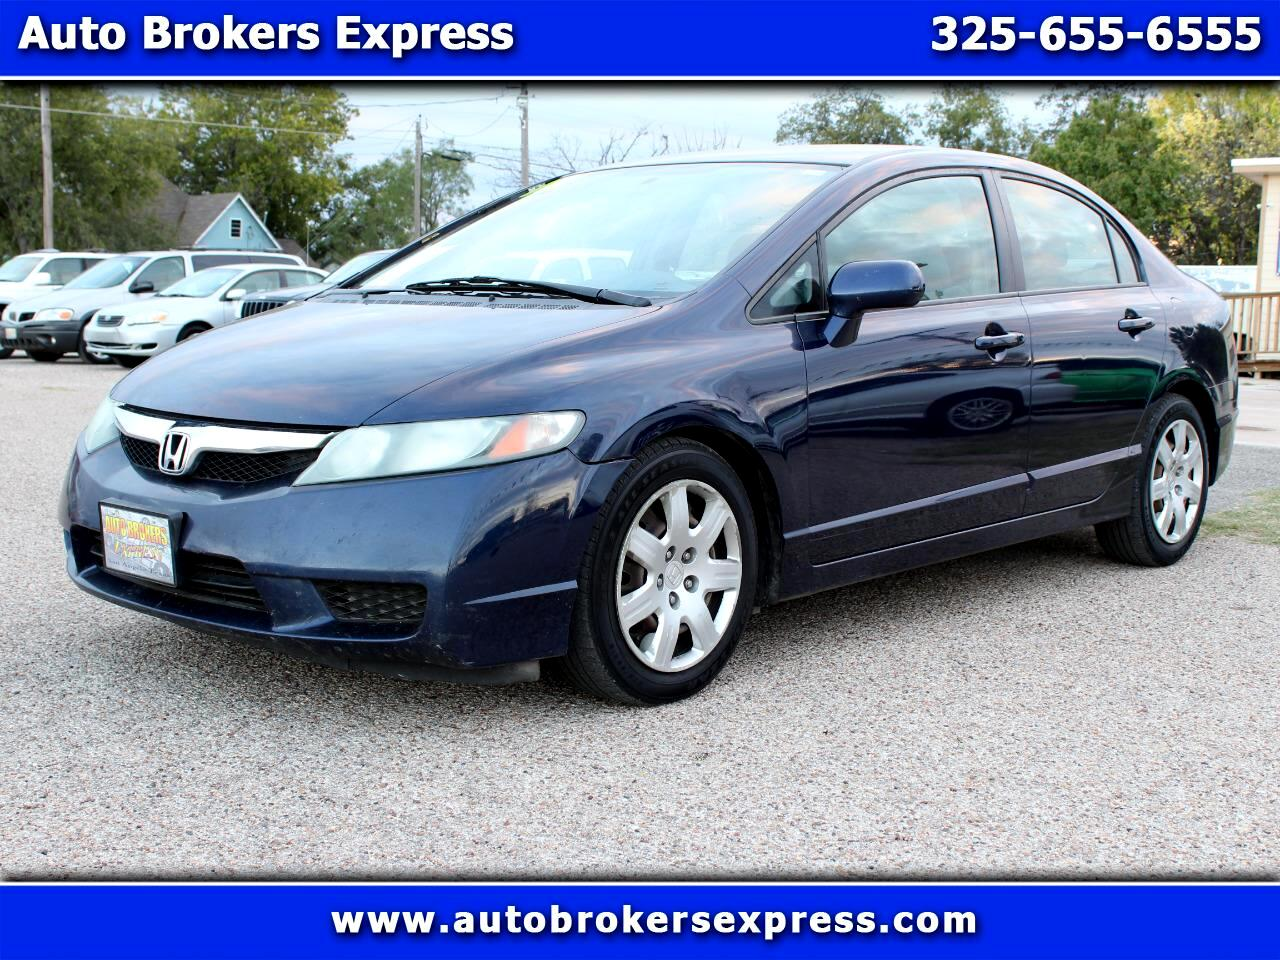 2010 Honda Civic 4dr Sdn LX Auto